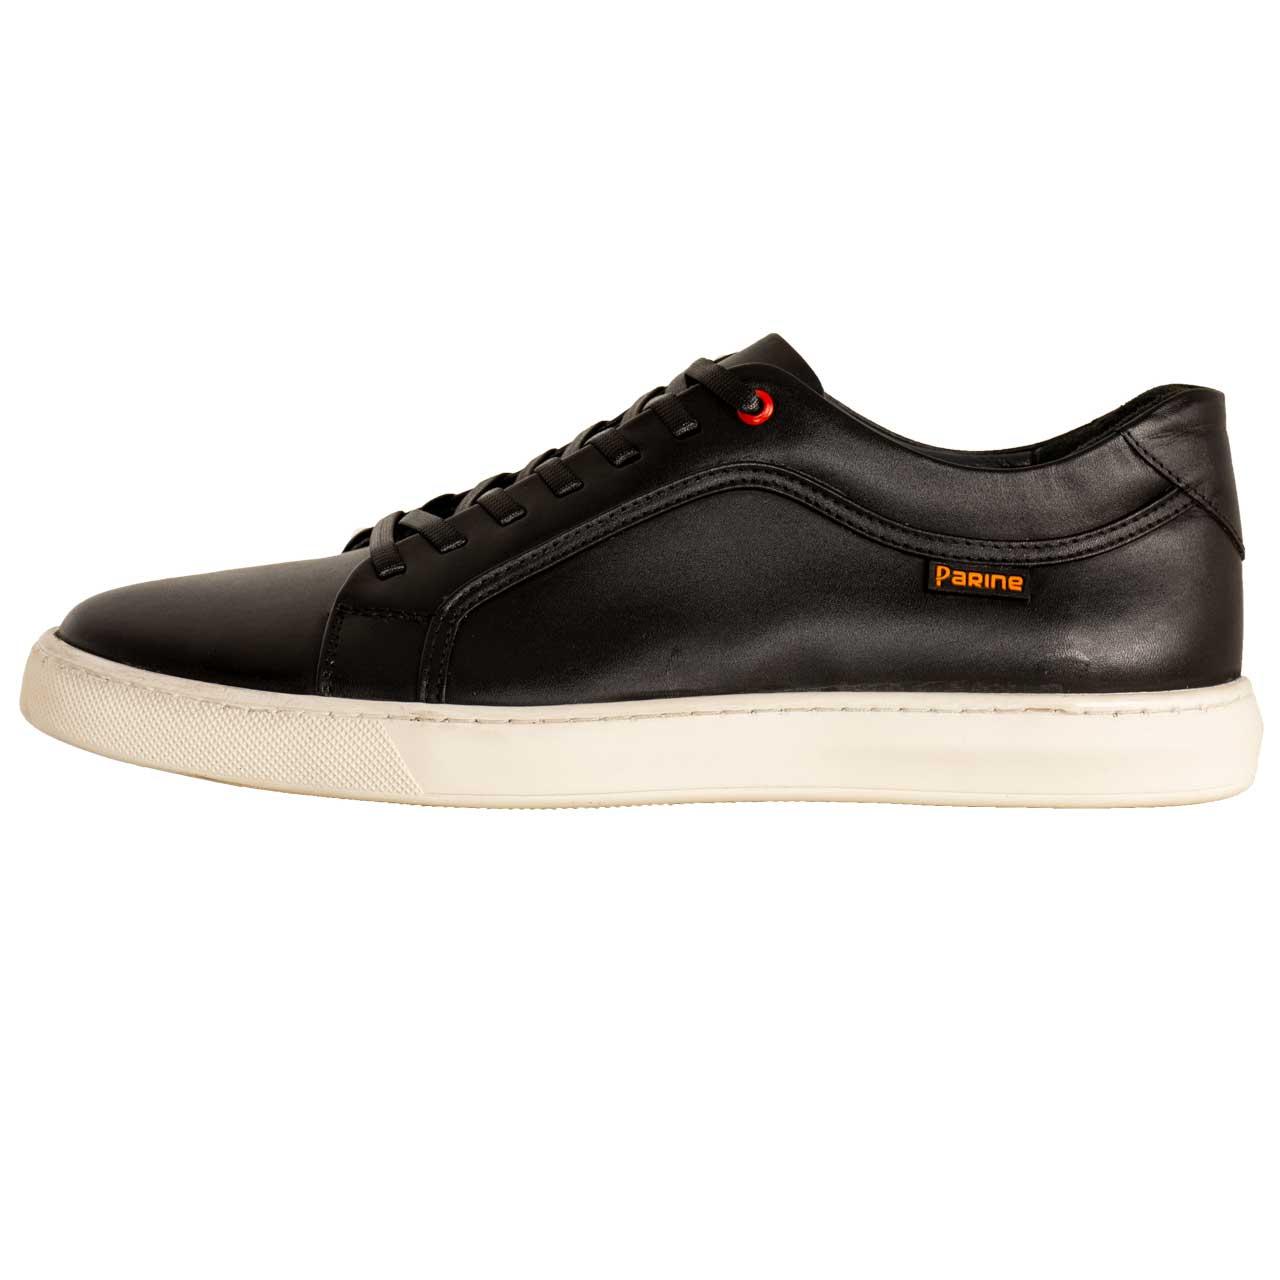 PARINECHARM leather men's casual shoes , SHO219 Model